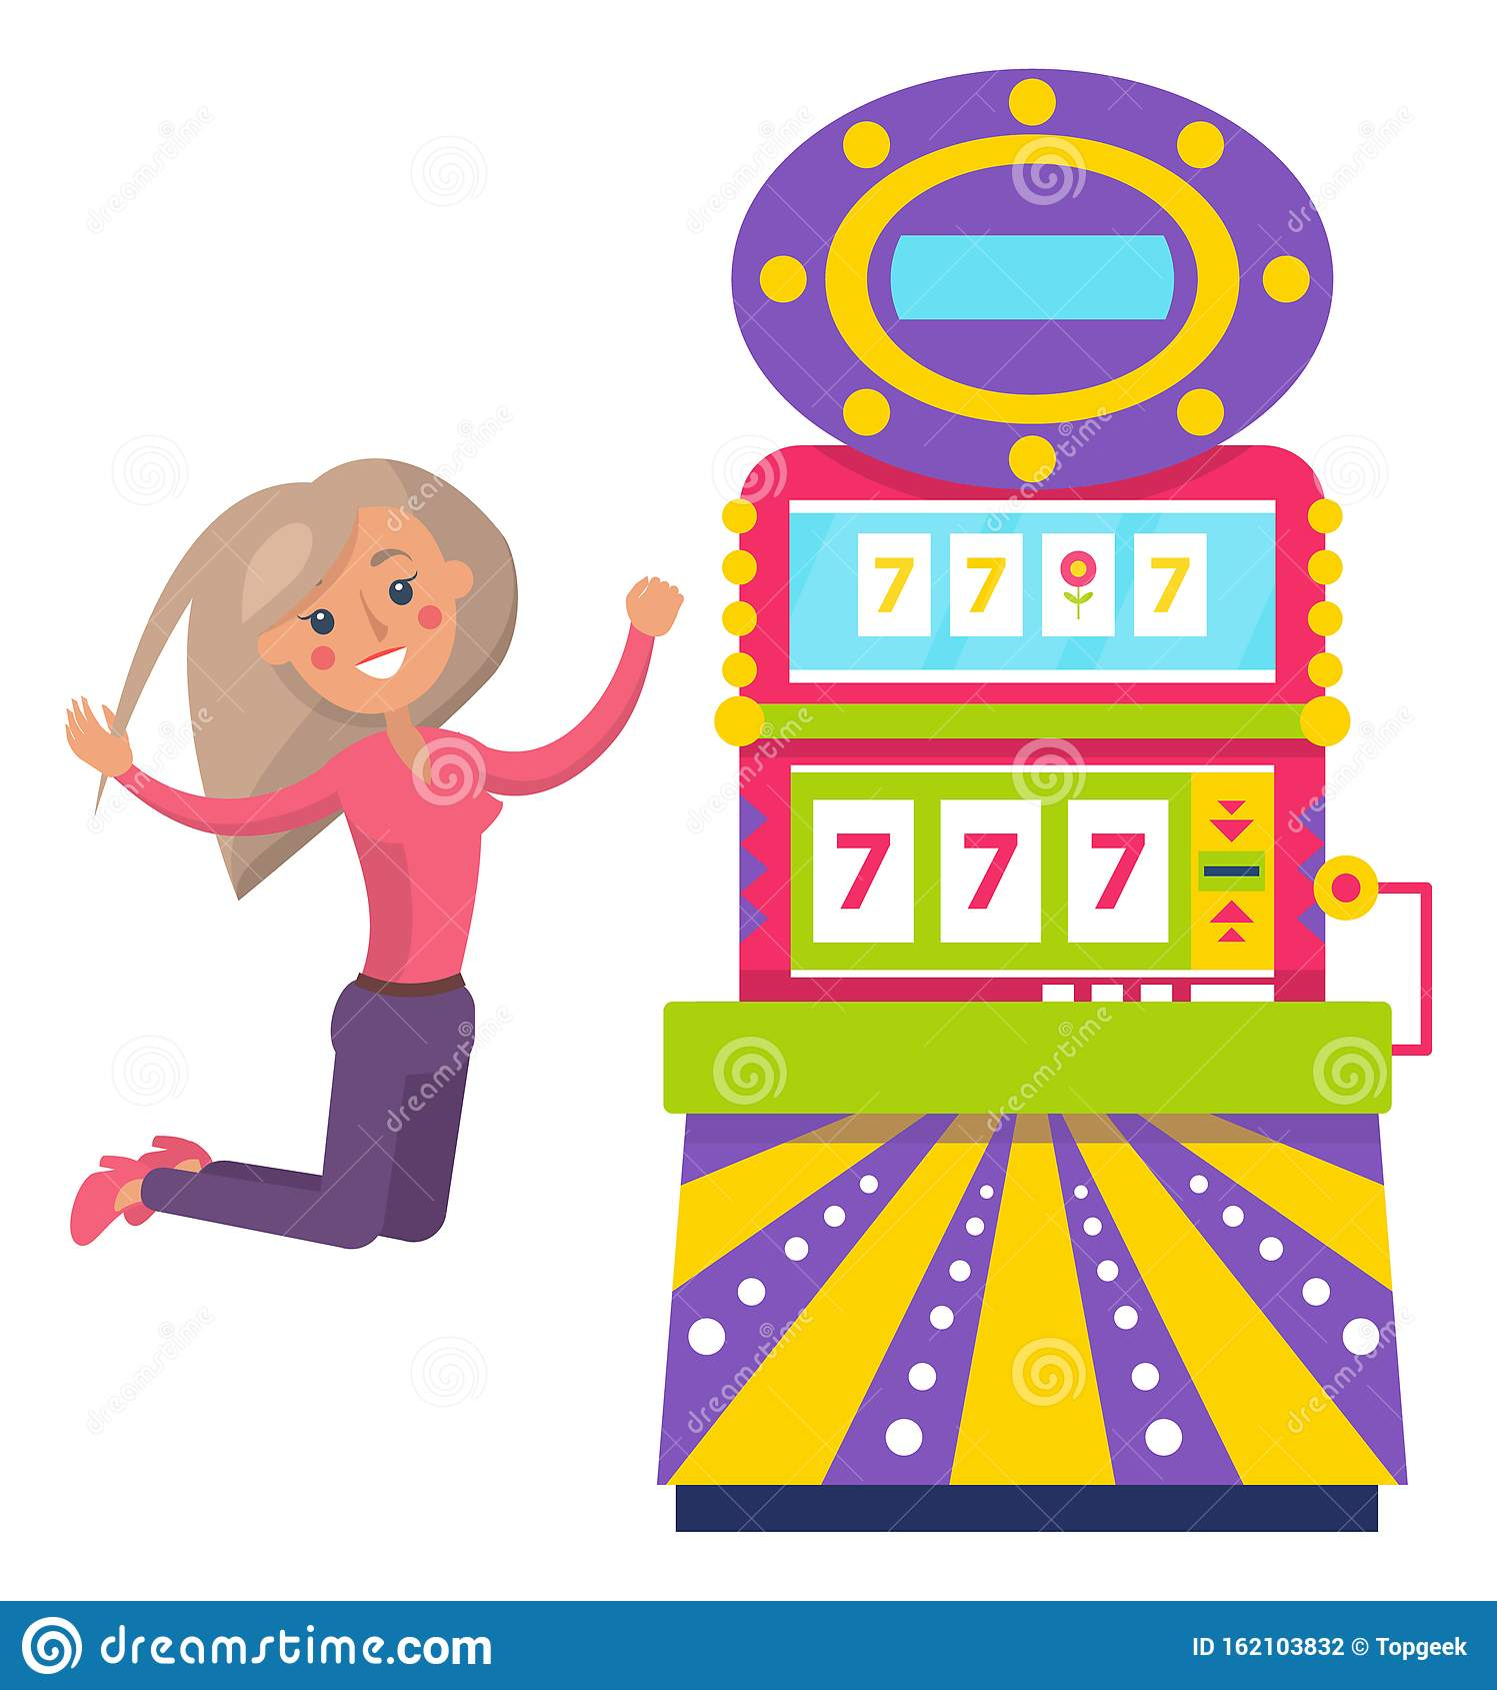 Free Slots No Download No Registration: Free Slot Machines Instant Play